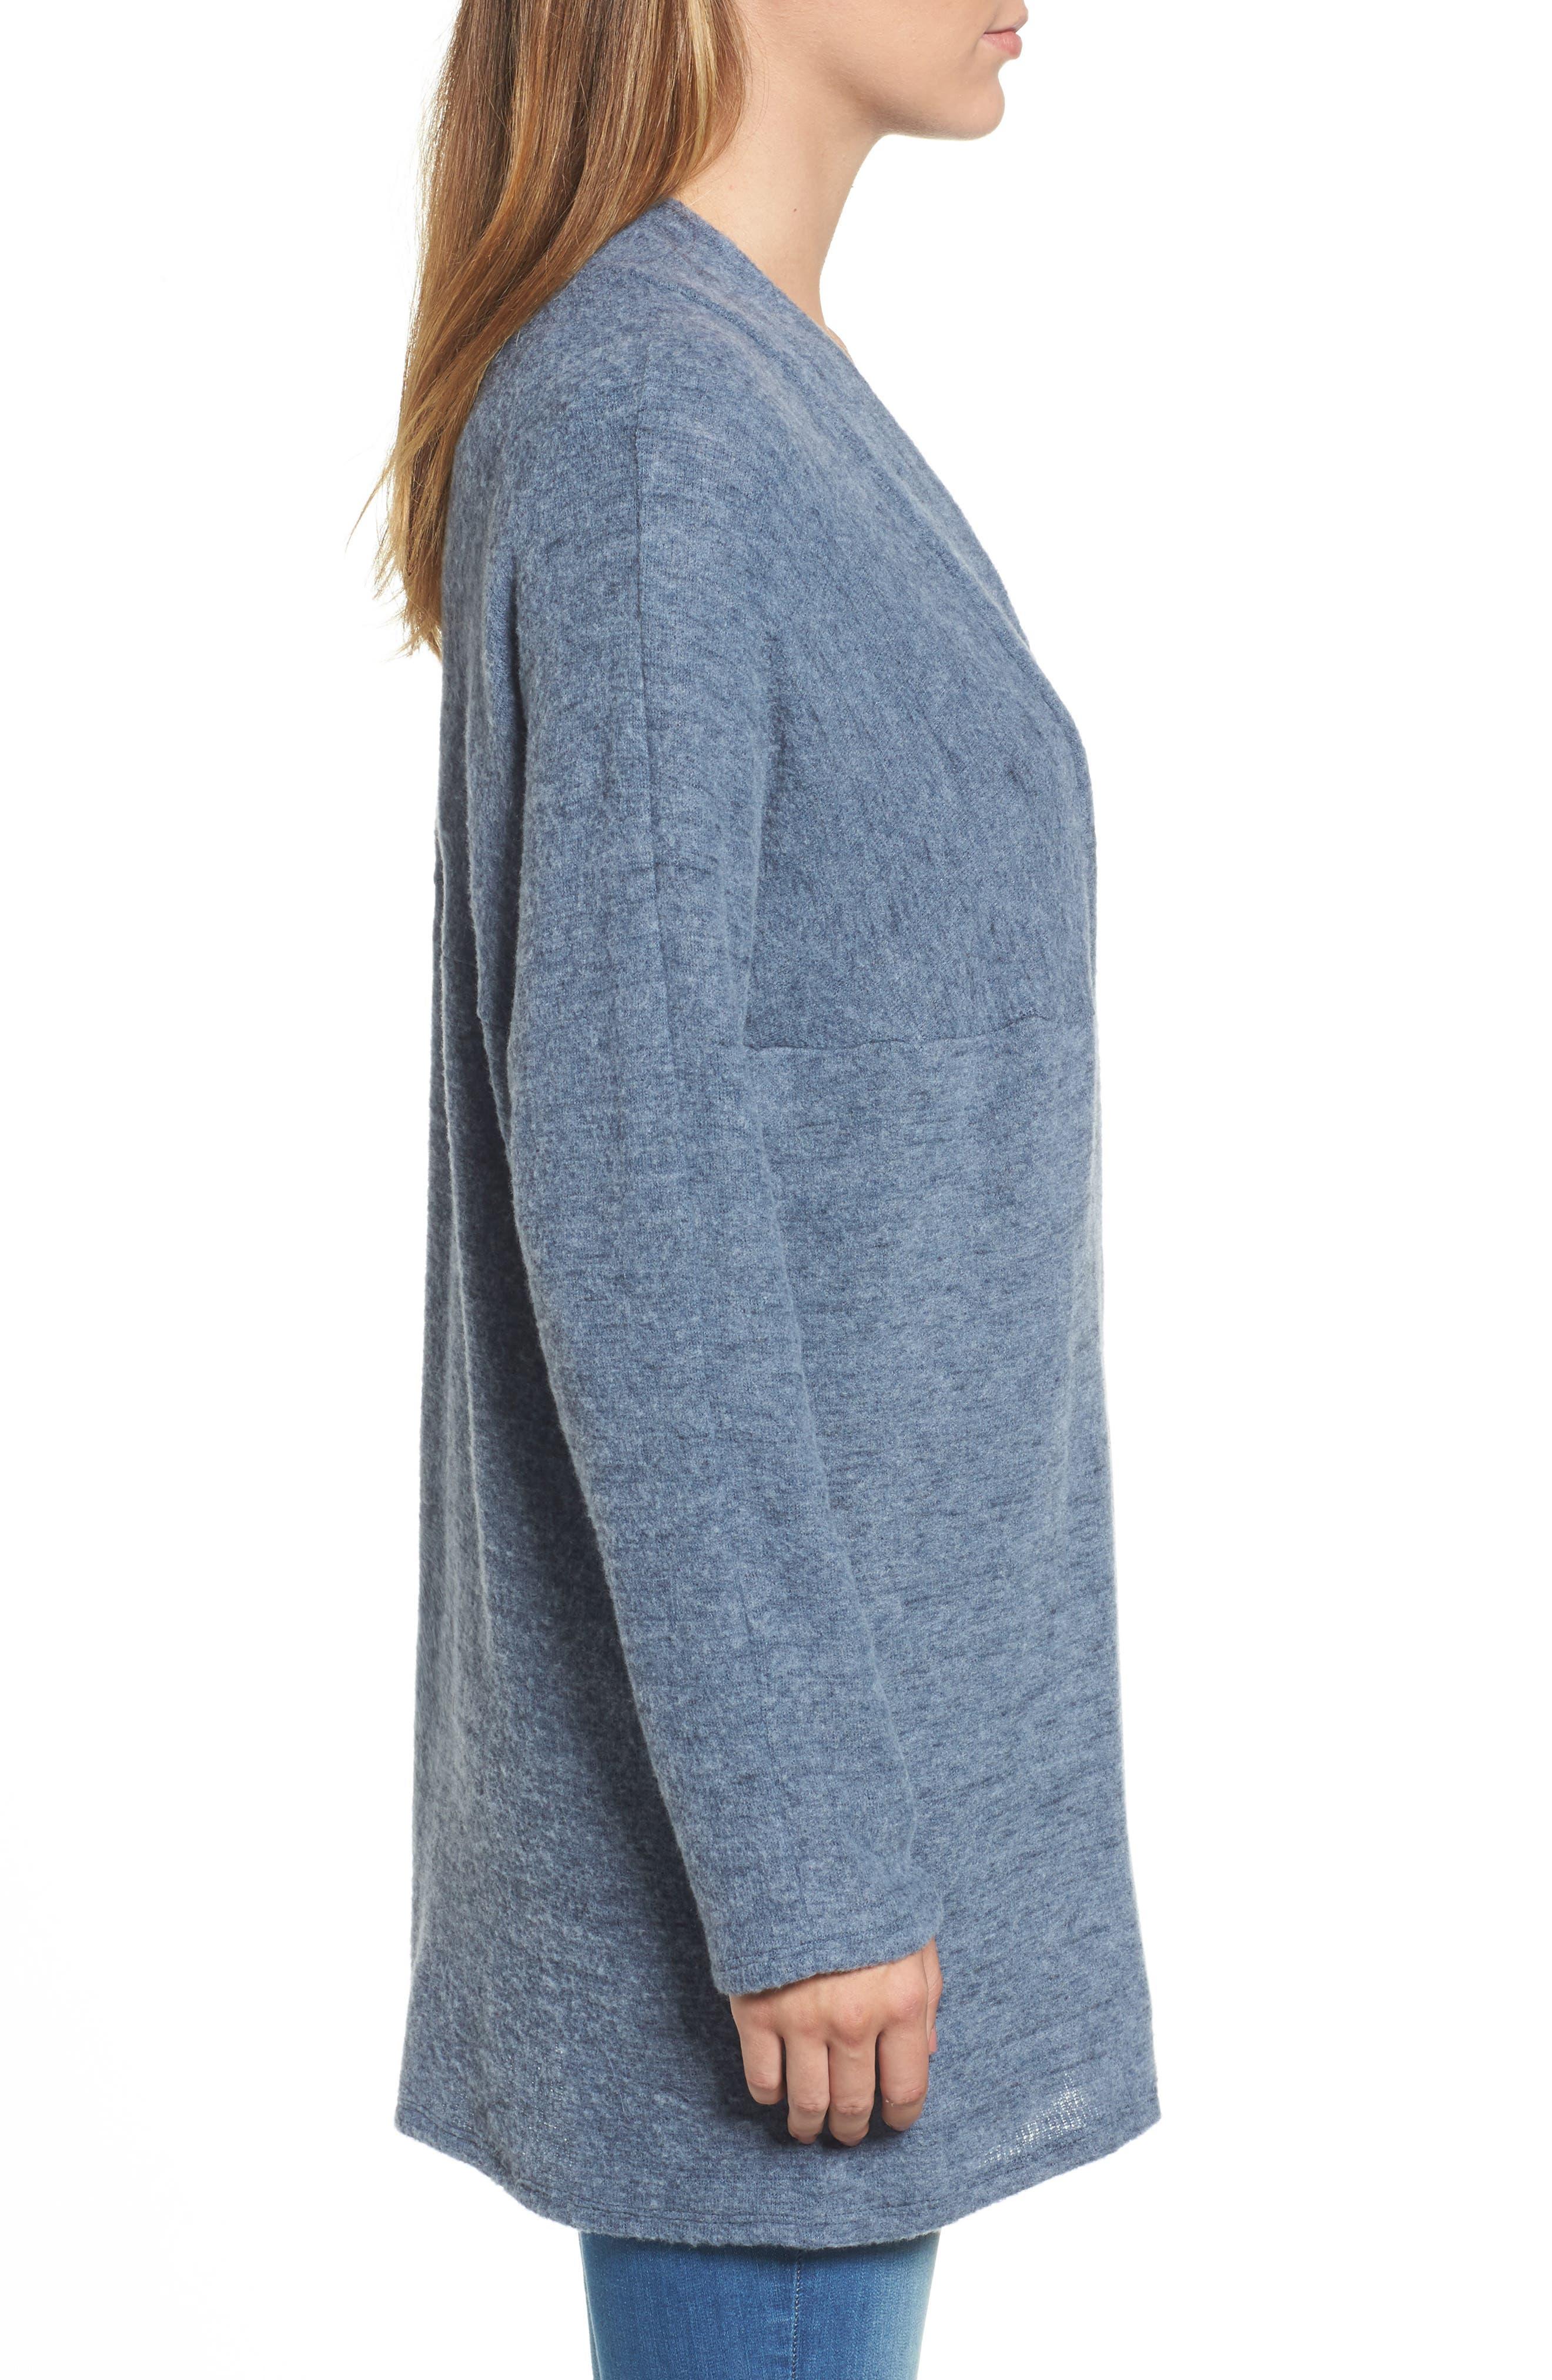 Caslon Open Knit Cardigan,                             Alternate thumbnail 3, color,                             Navy